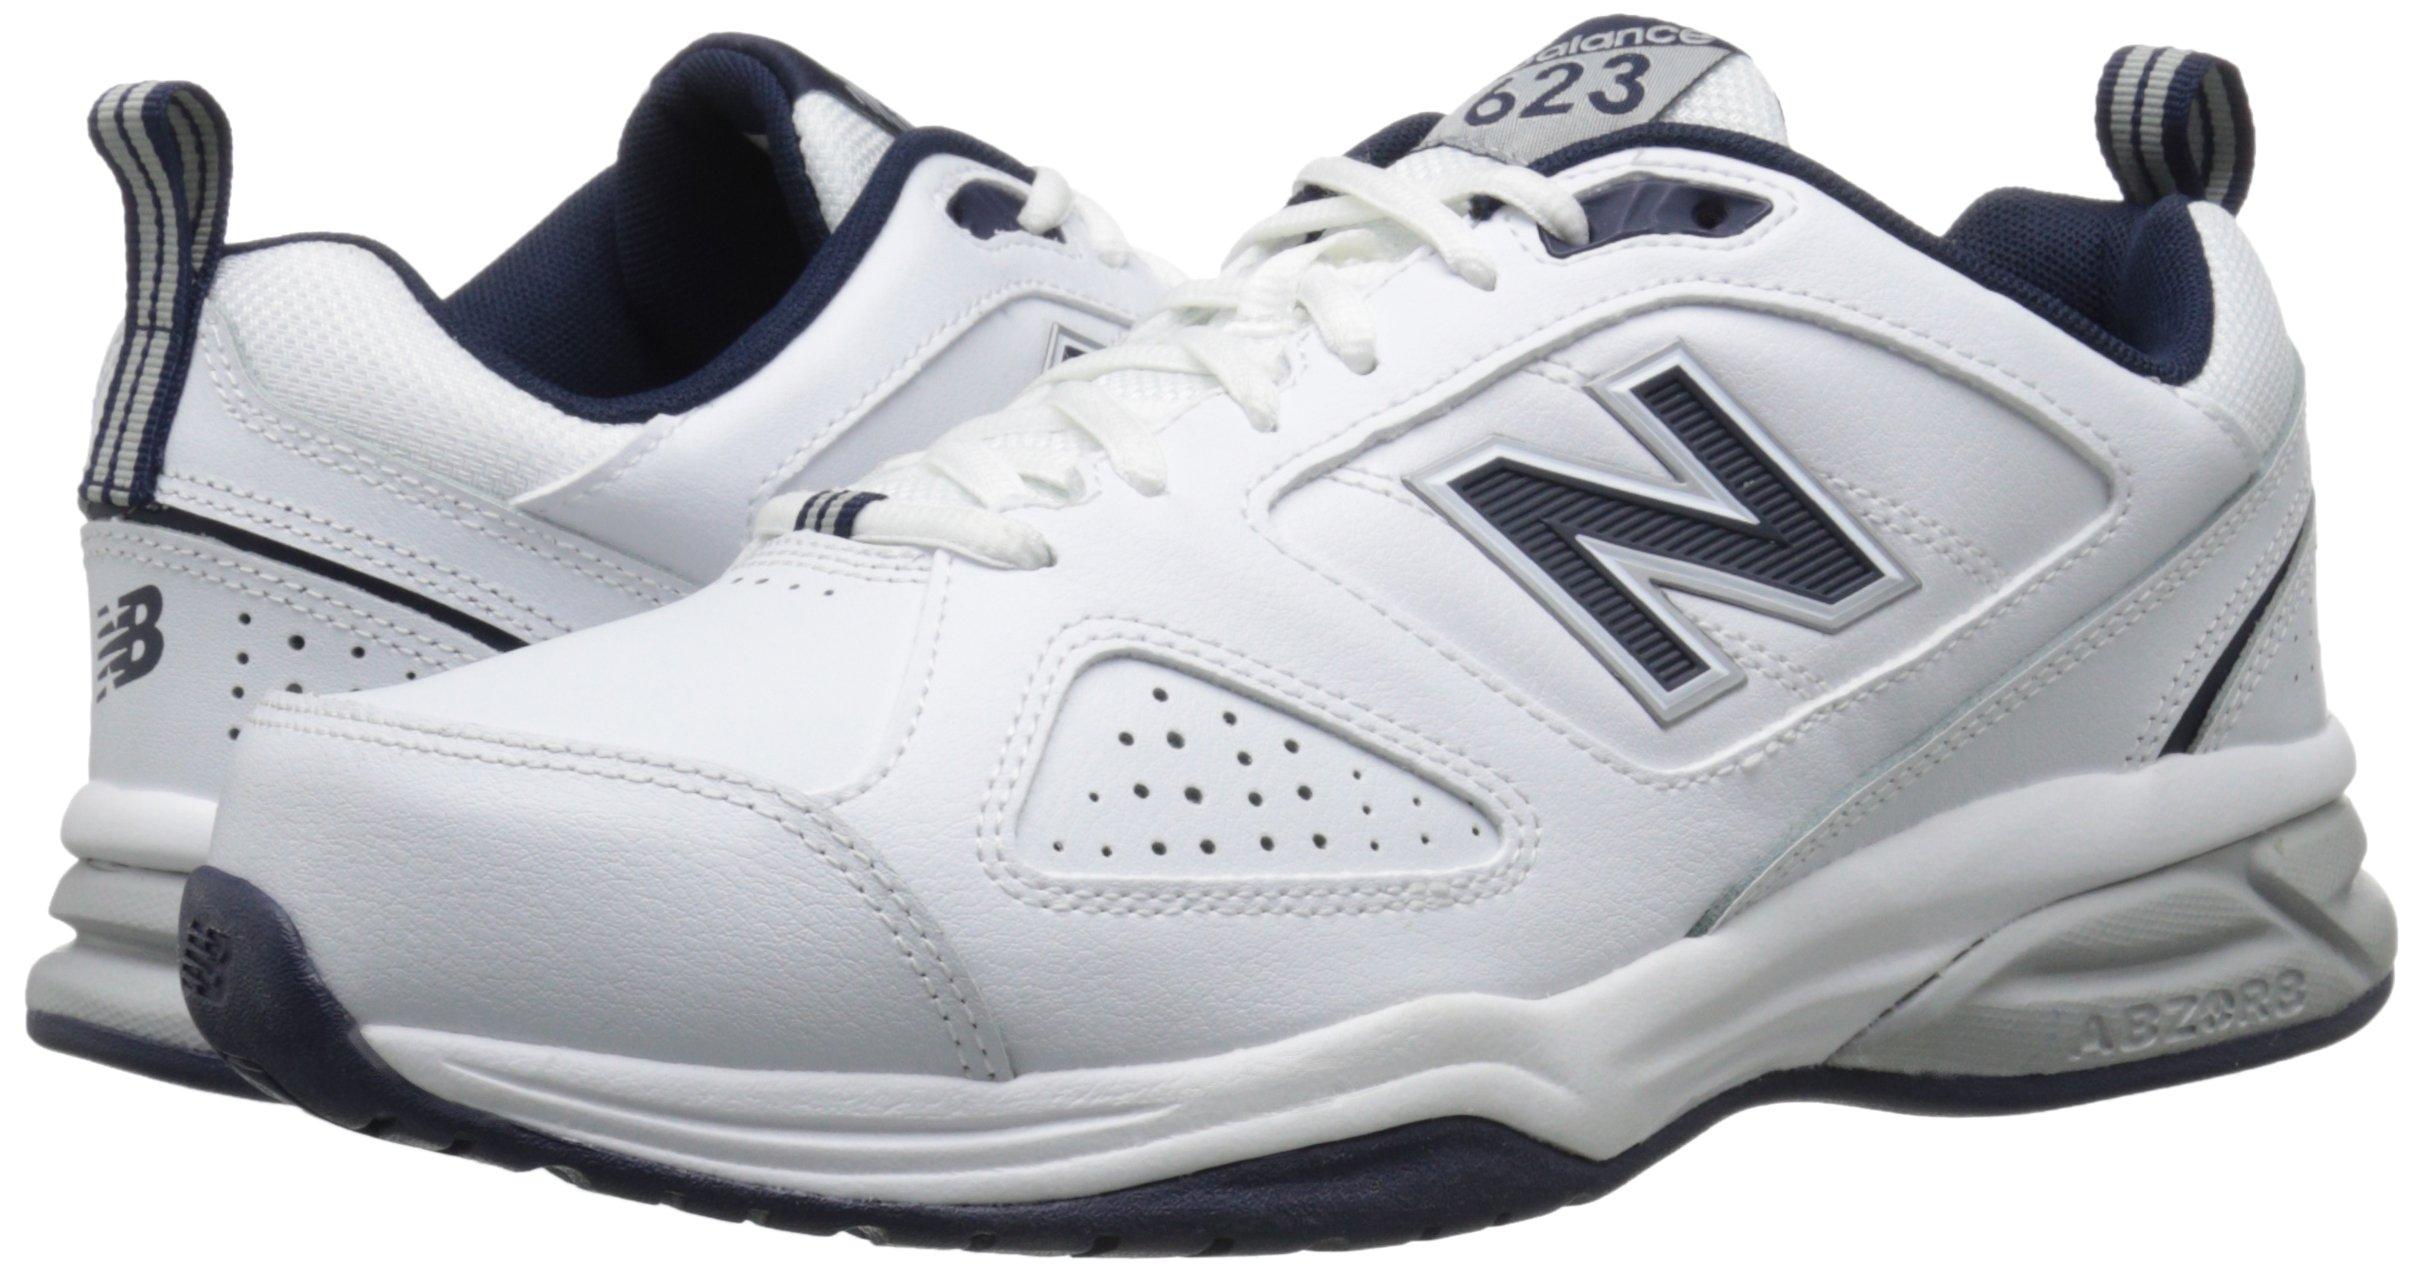 New Balance Men's MX623v3 Casual Comfort Training Shoe,  White/Navy, 8 M US by New Balance (Image #6)